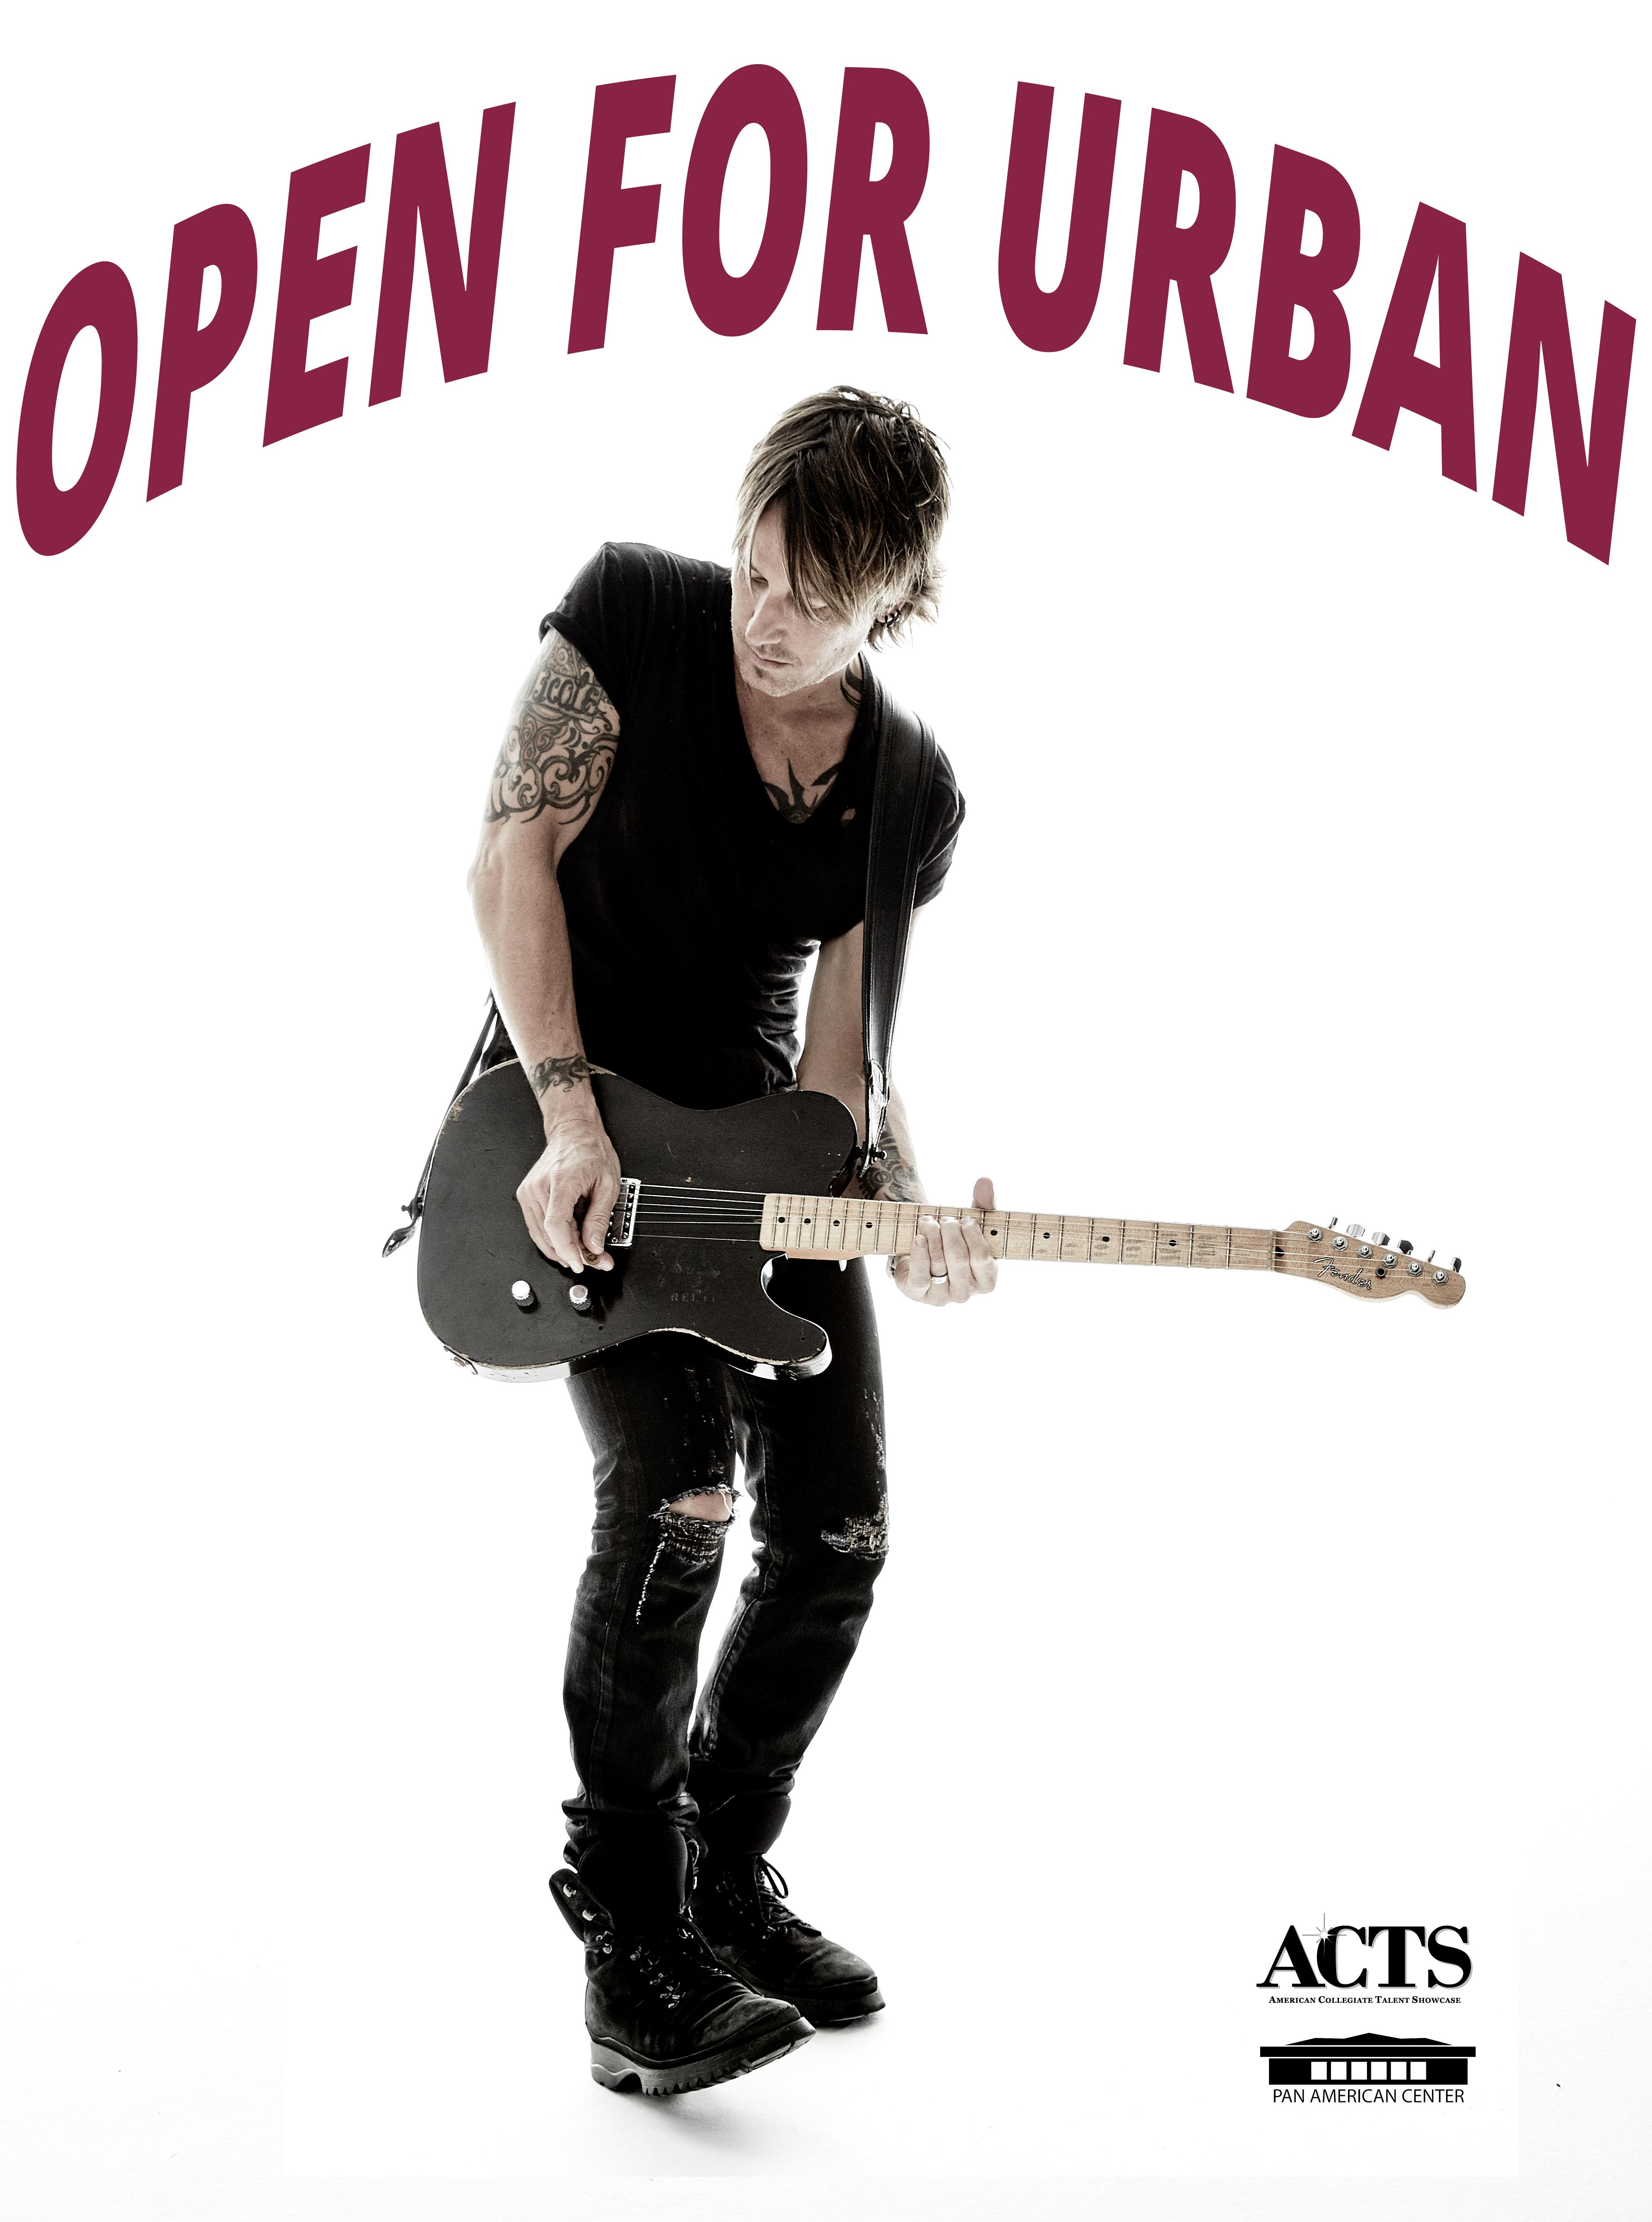 OpenForUrban